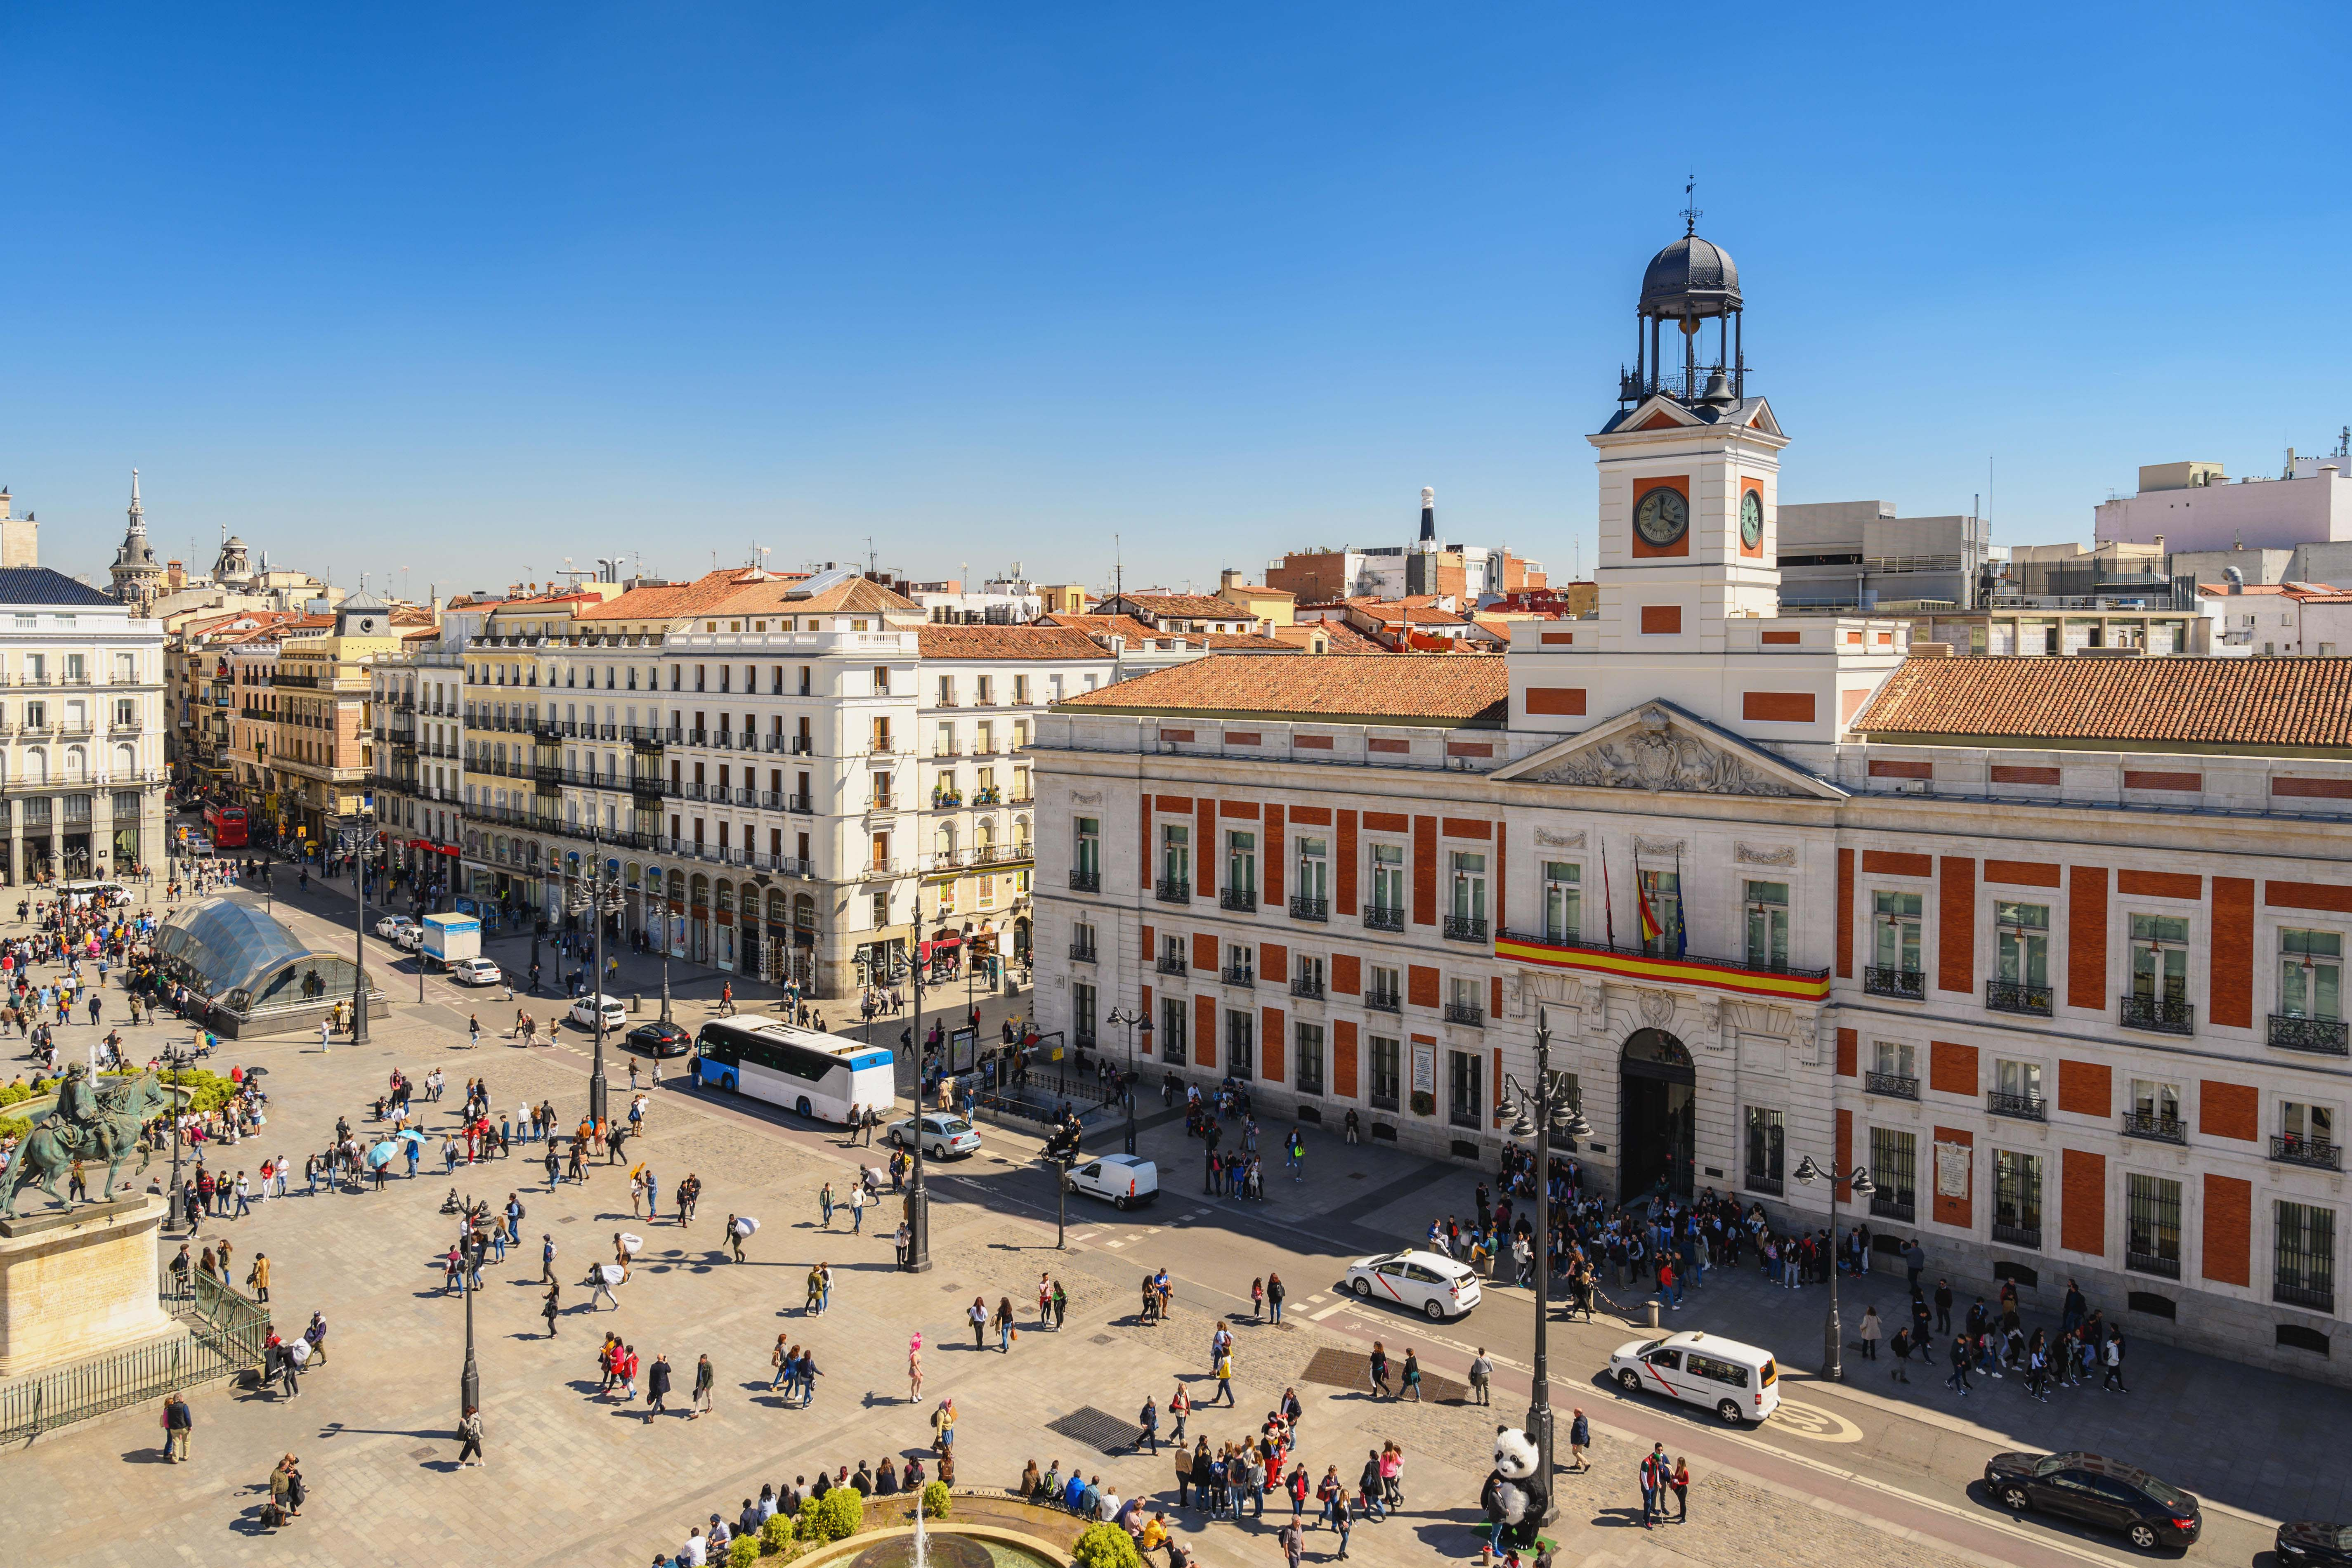 Madrid Spain, aerial view city skyline at Puerta del Sol